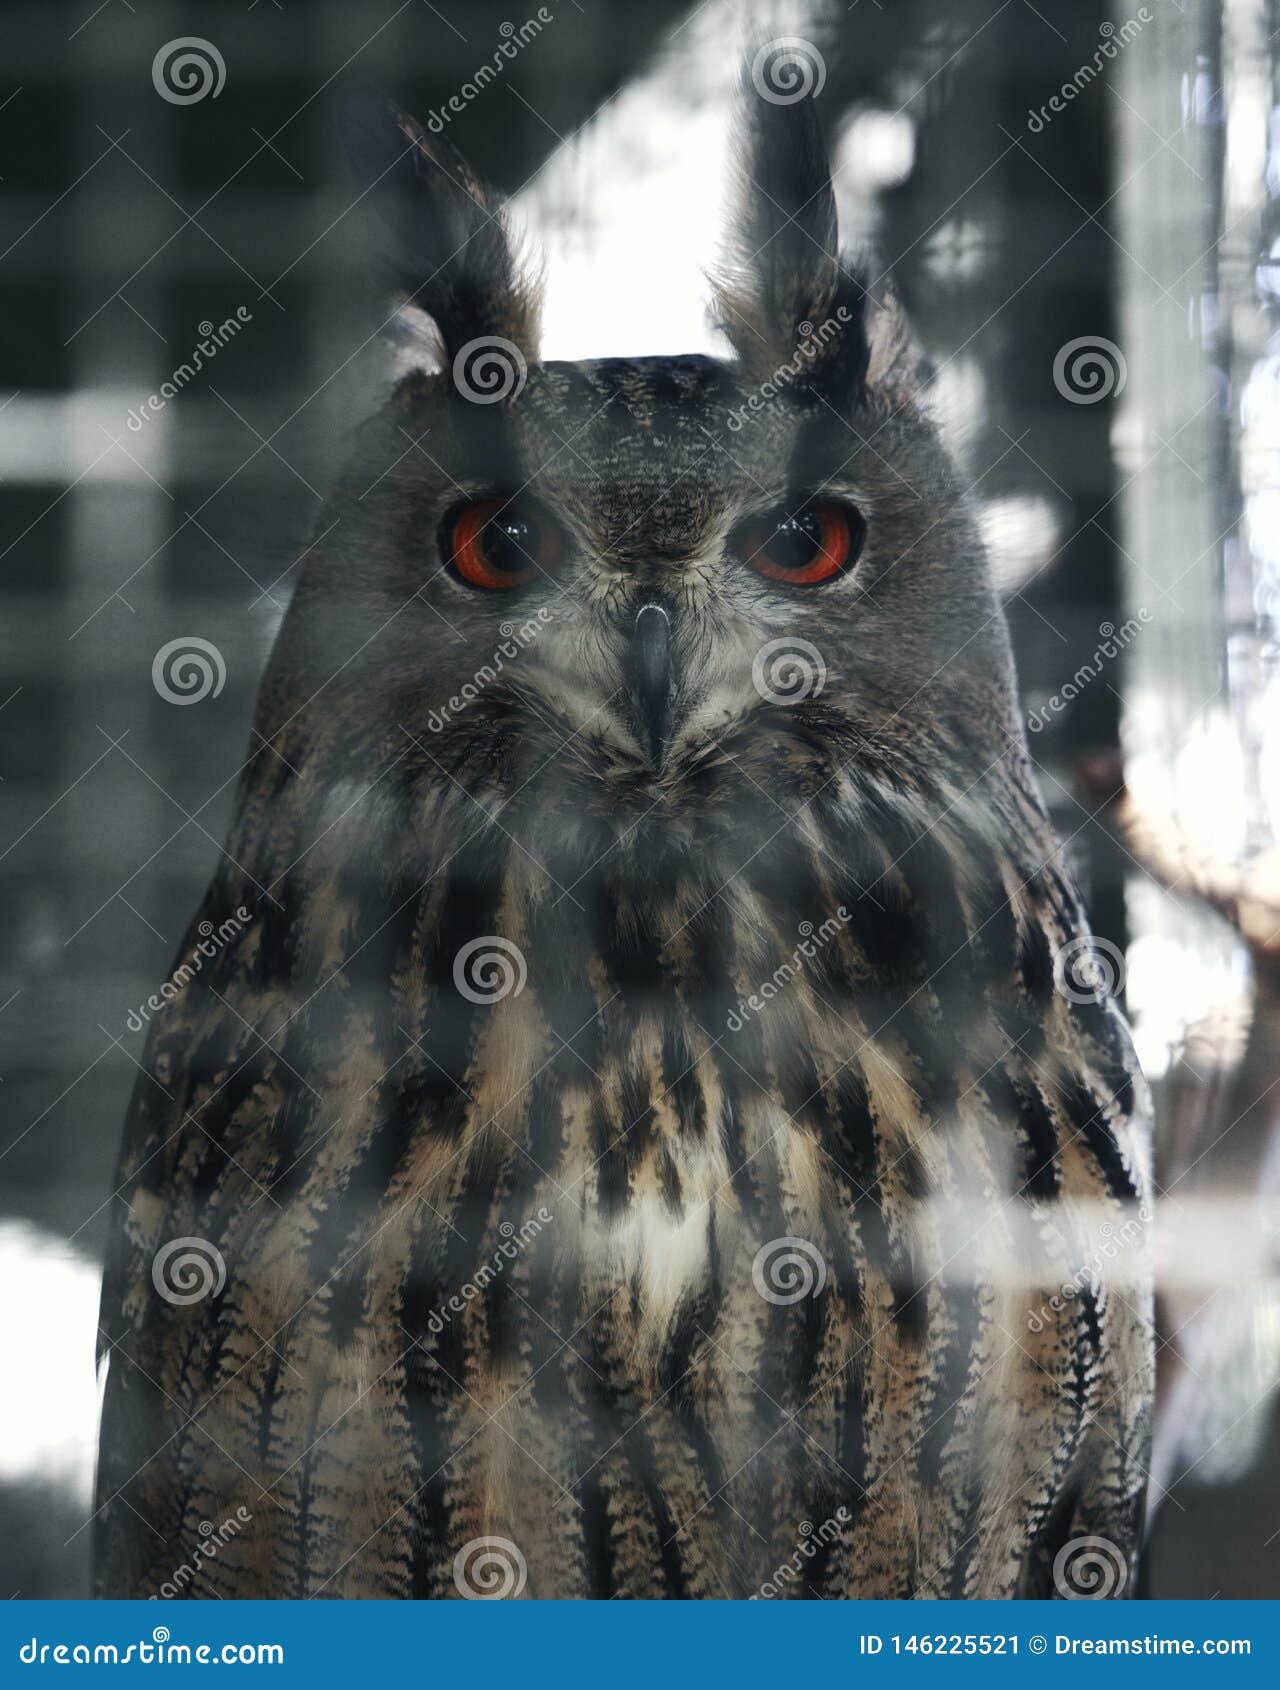 Looks wise owl. Beautiful bird